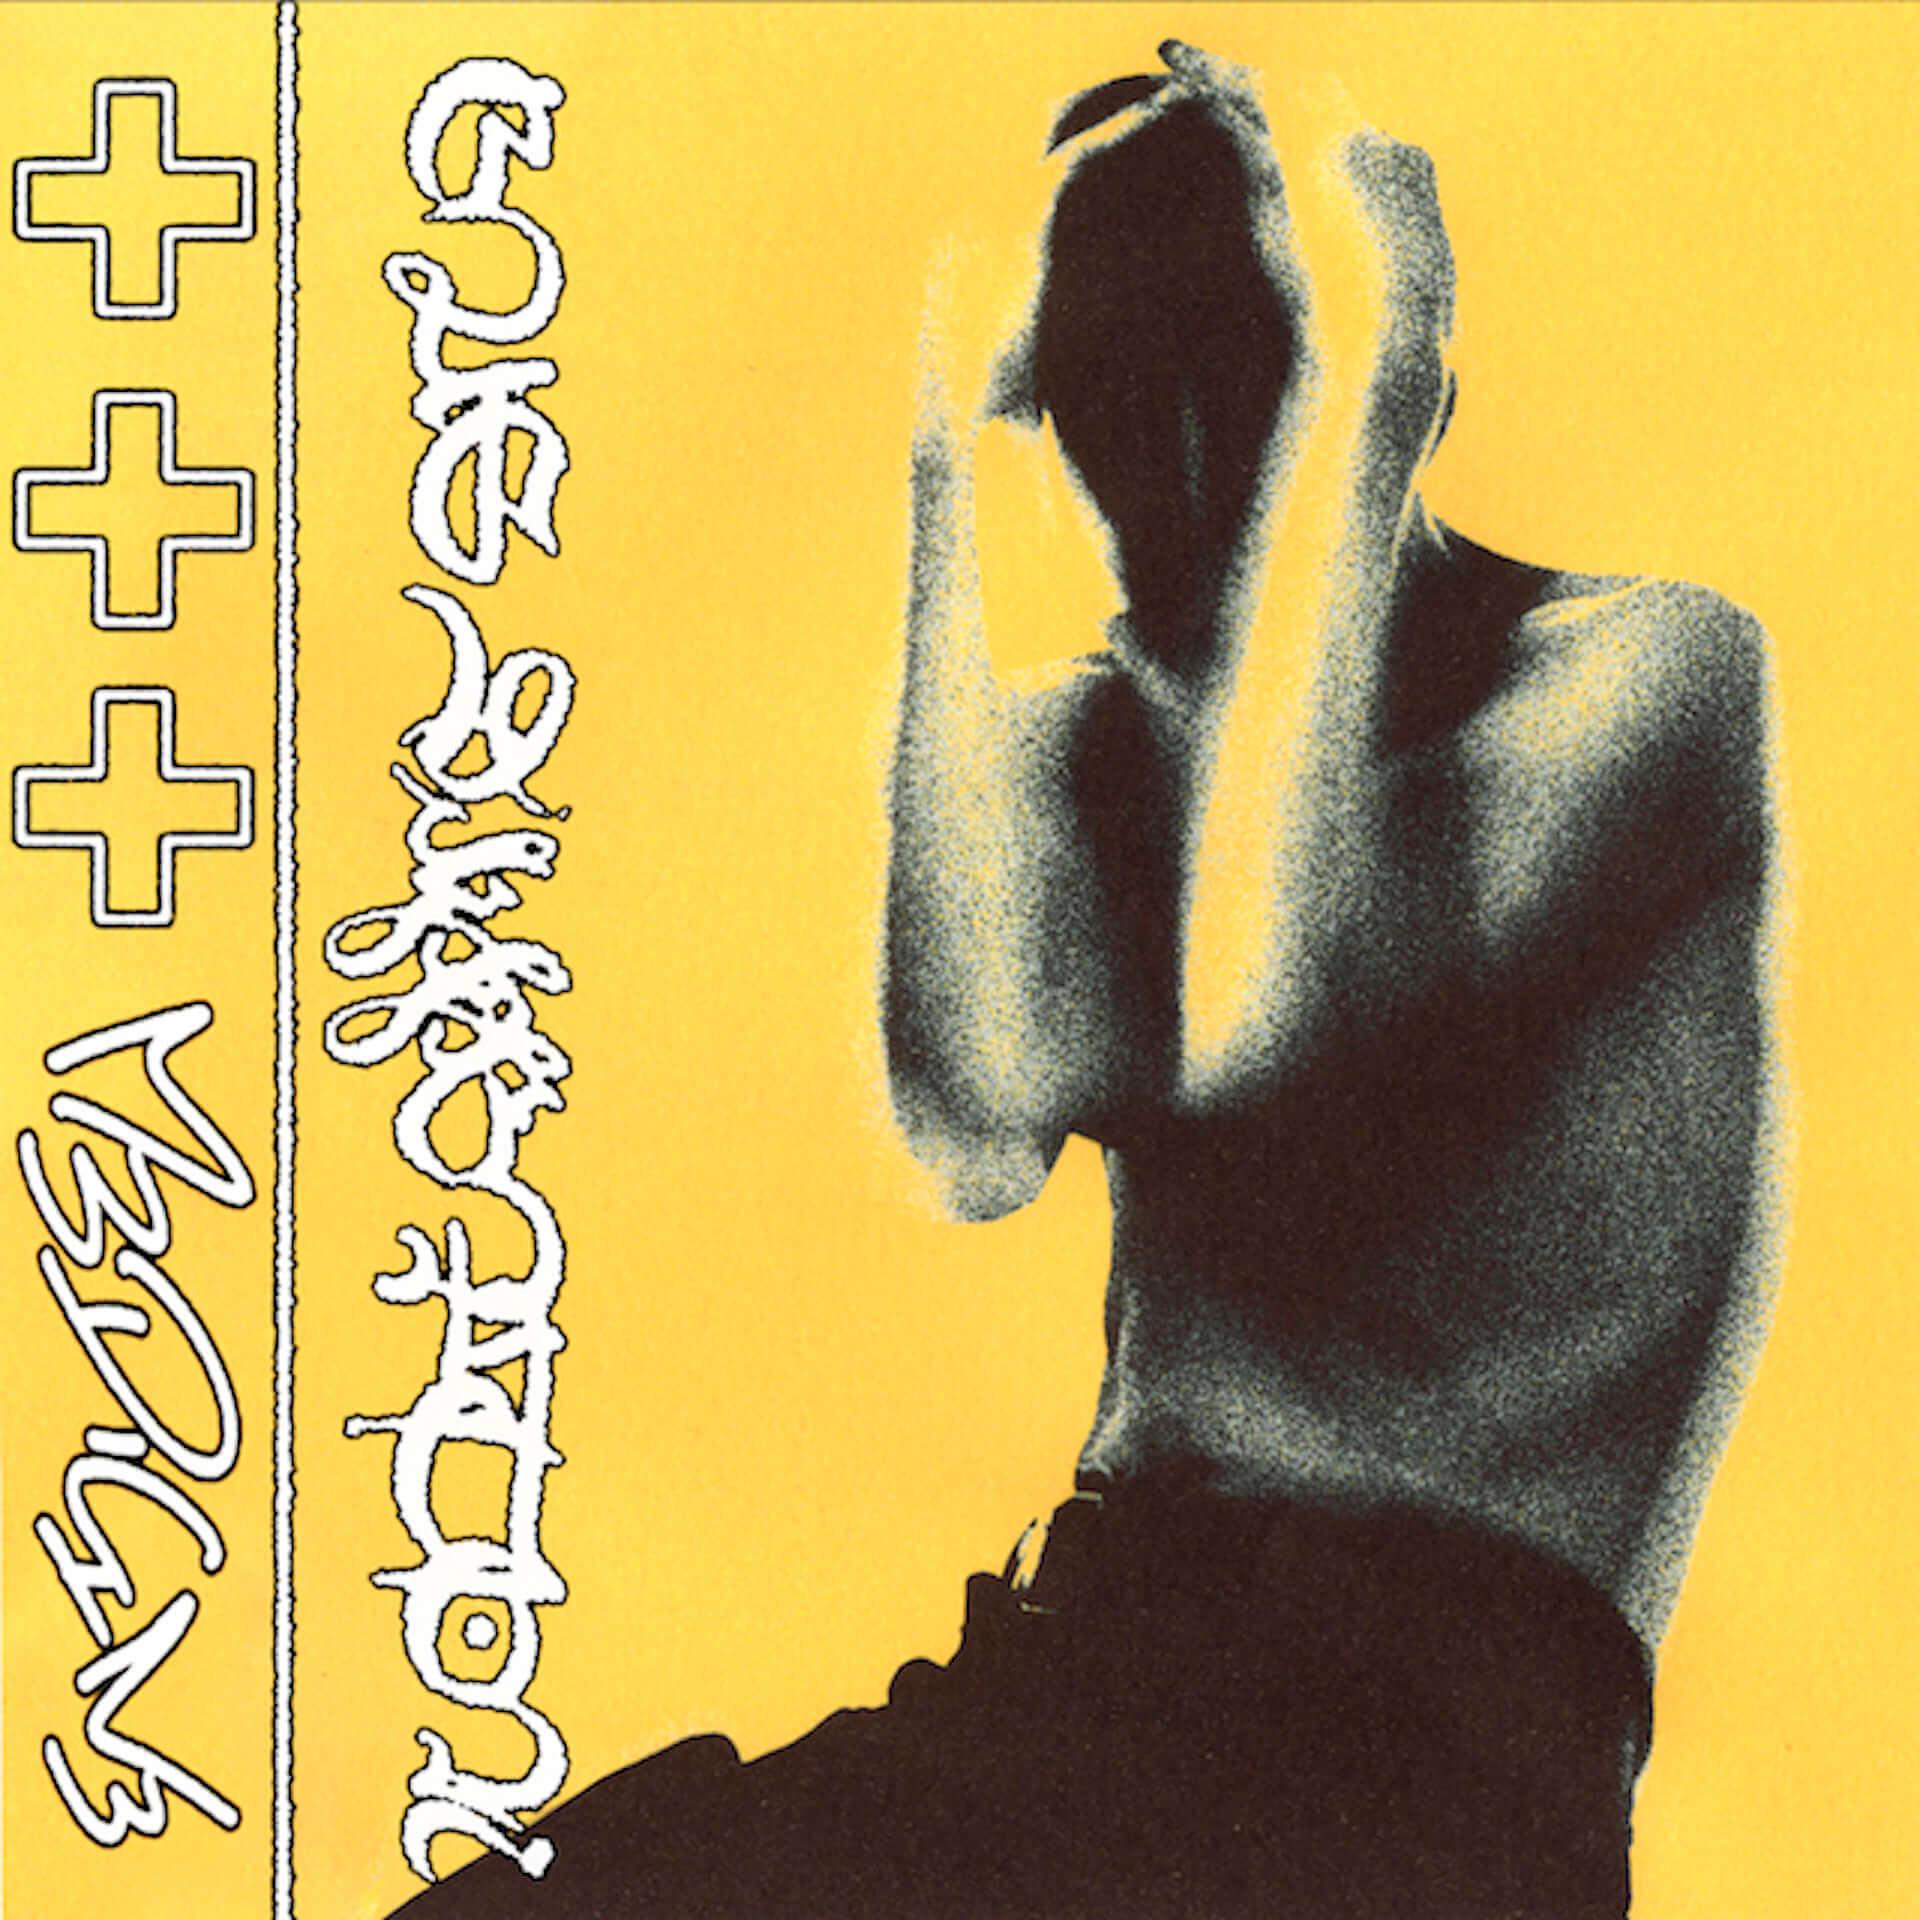 "Gus Dappertonが自身の人生を綴った楽曲""Medicine""を公開!最新作『Orca』のアナログ盤も発売決定 music200903_gusdapperton_10-1920x1920"